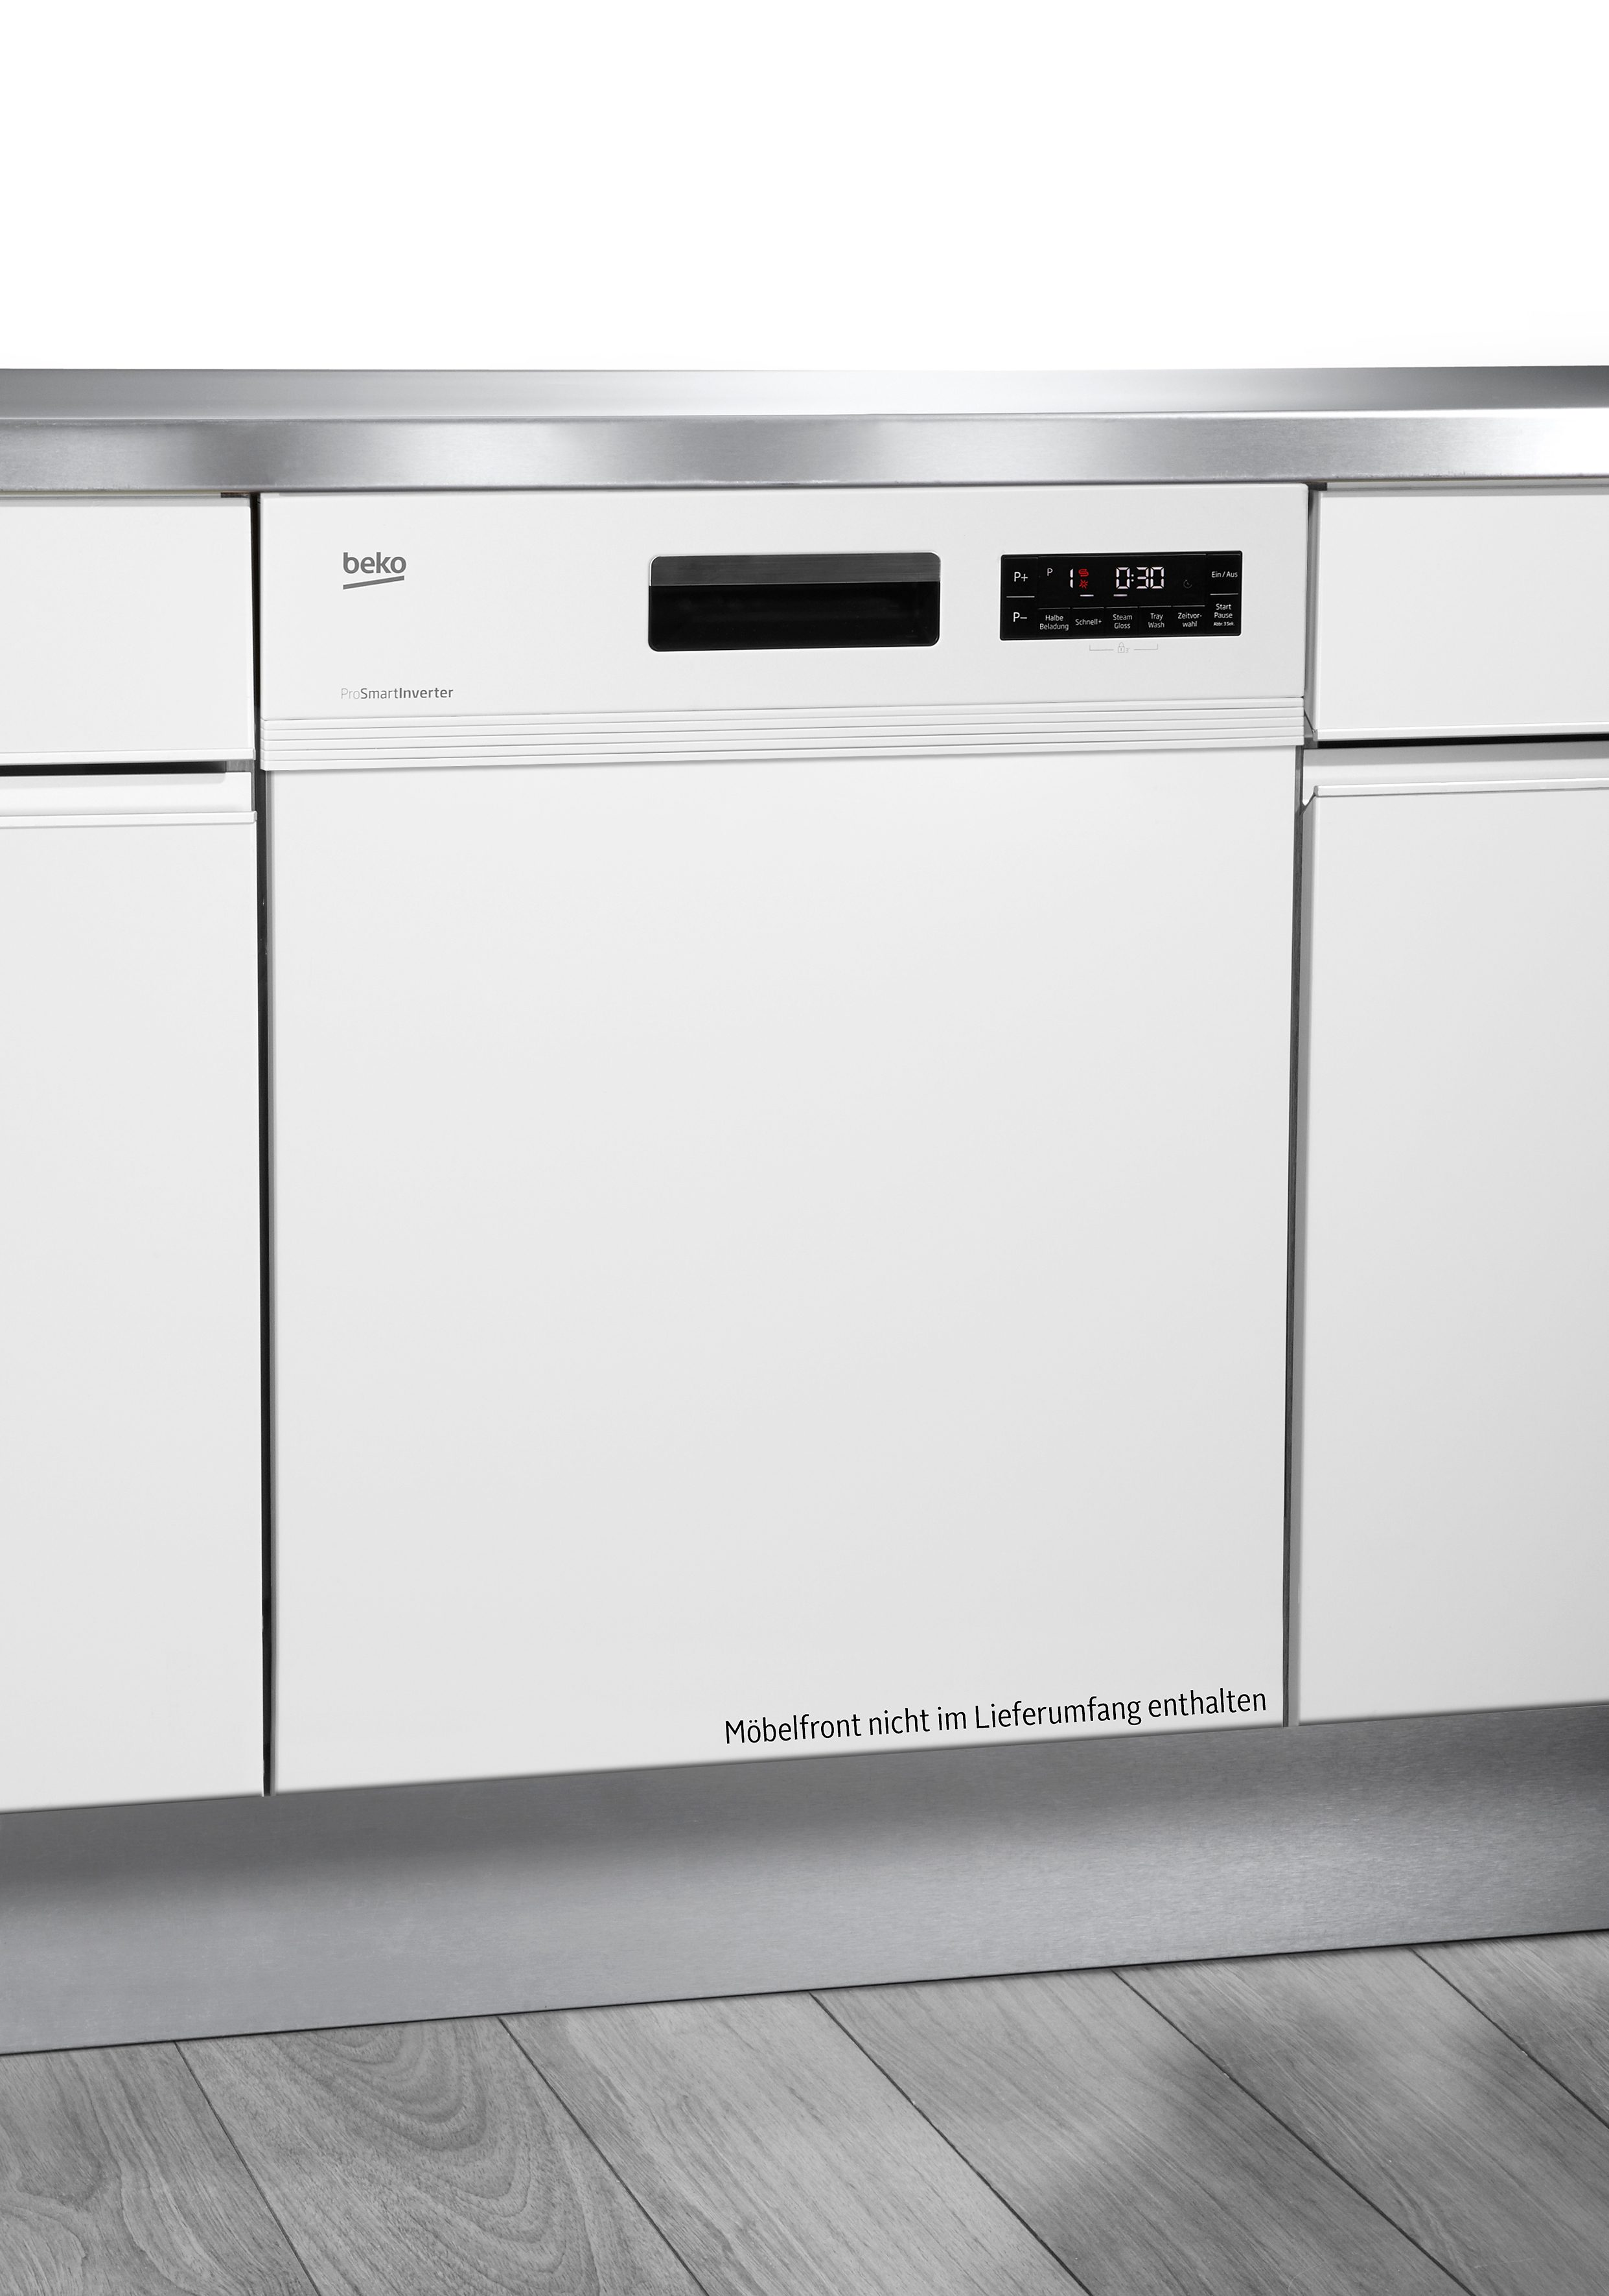 BEKO teilintegrierbarer Geschirrspüler, DSN6634W1, 10 l, 13 Maßgedecke